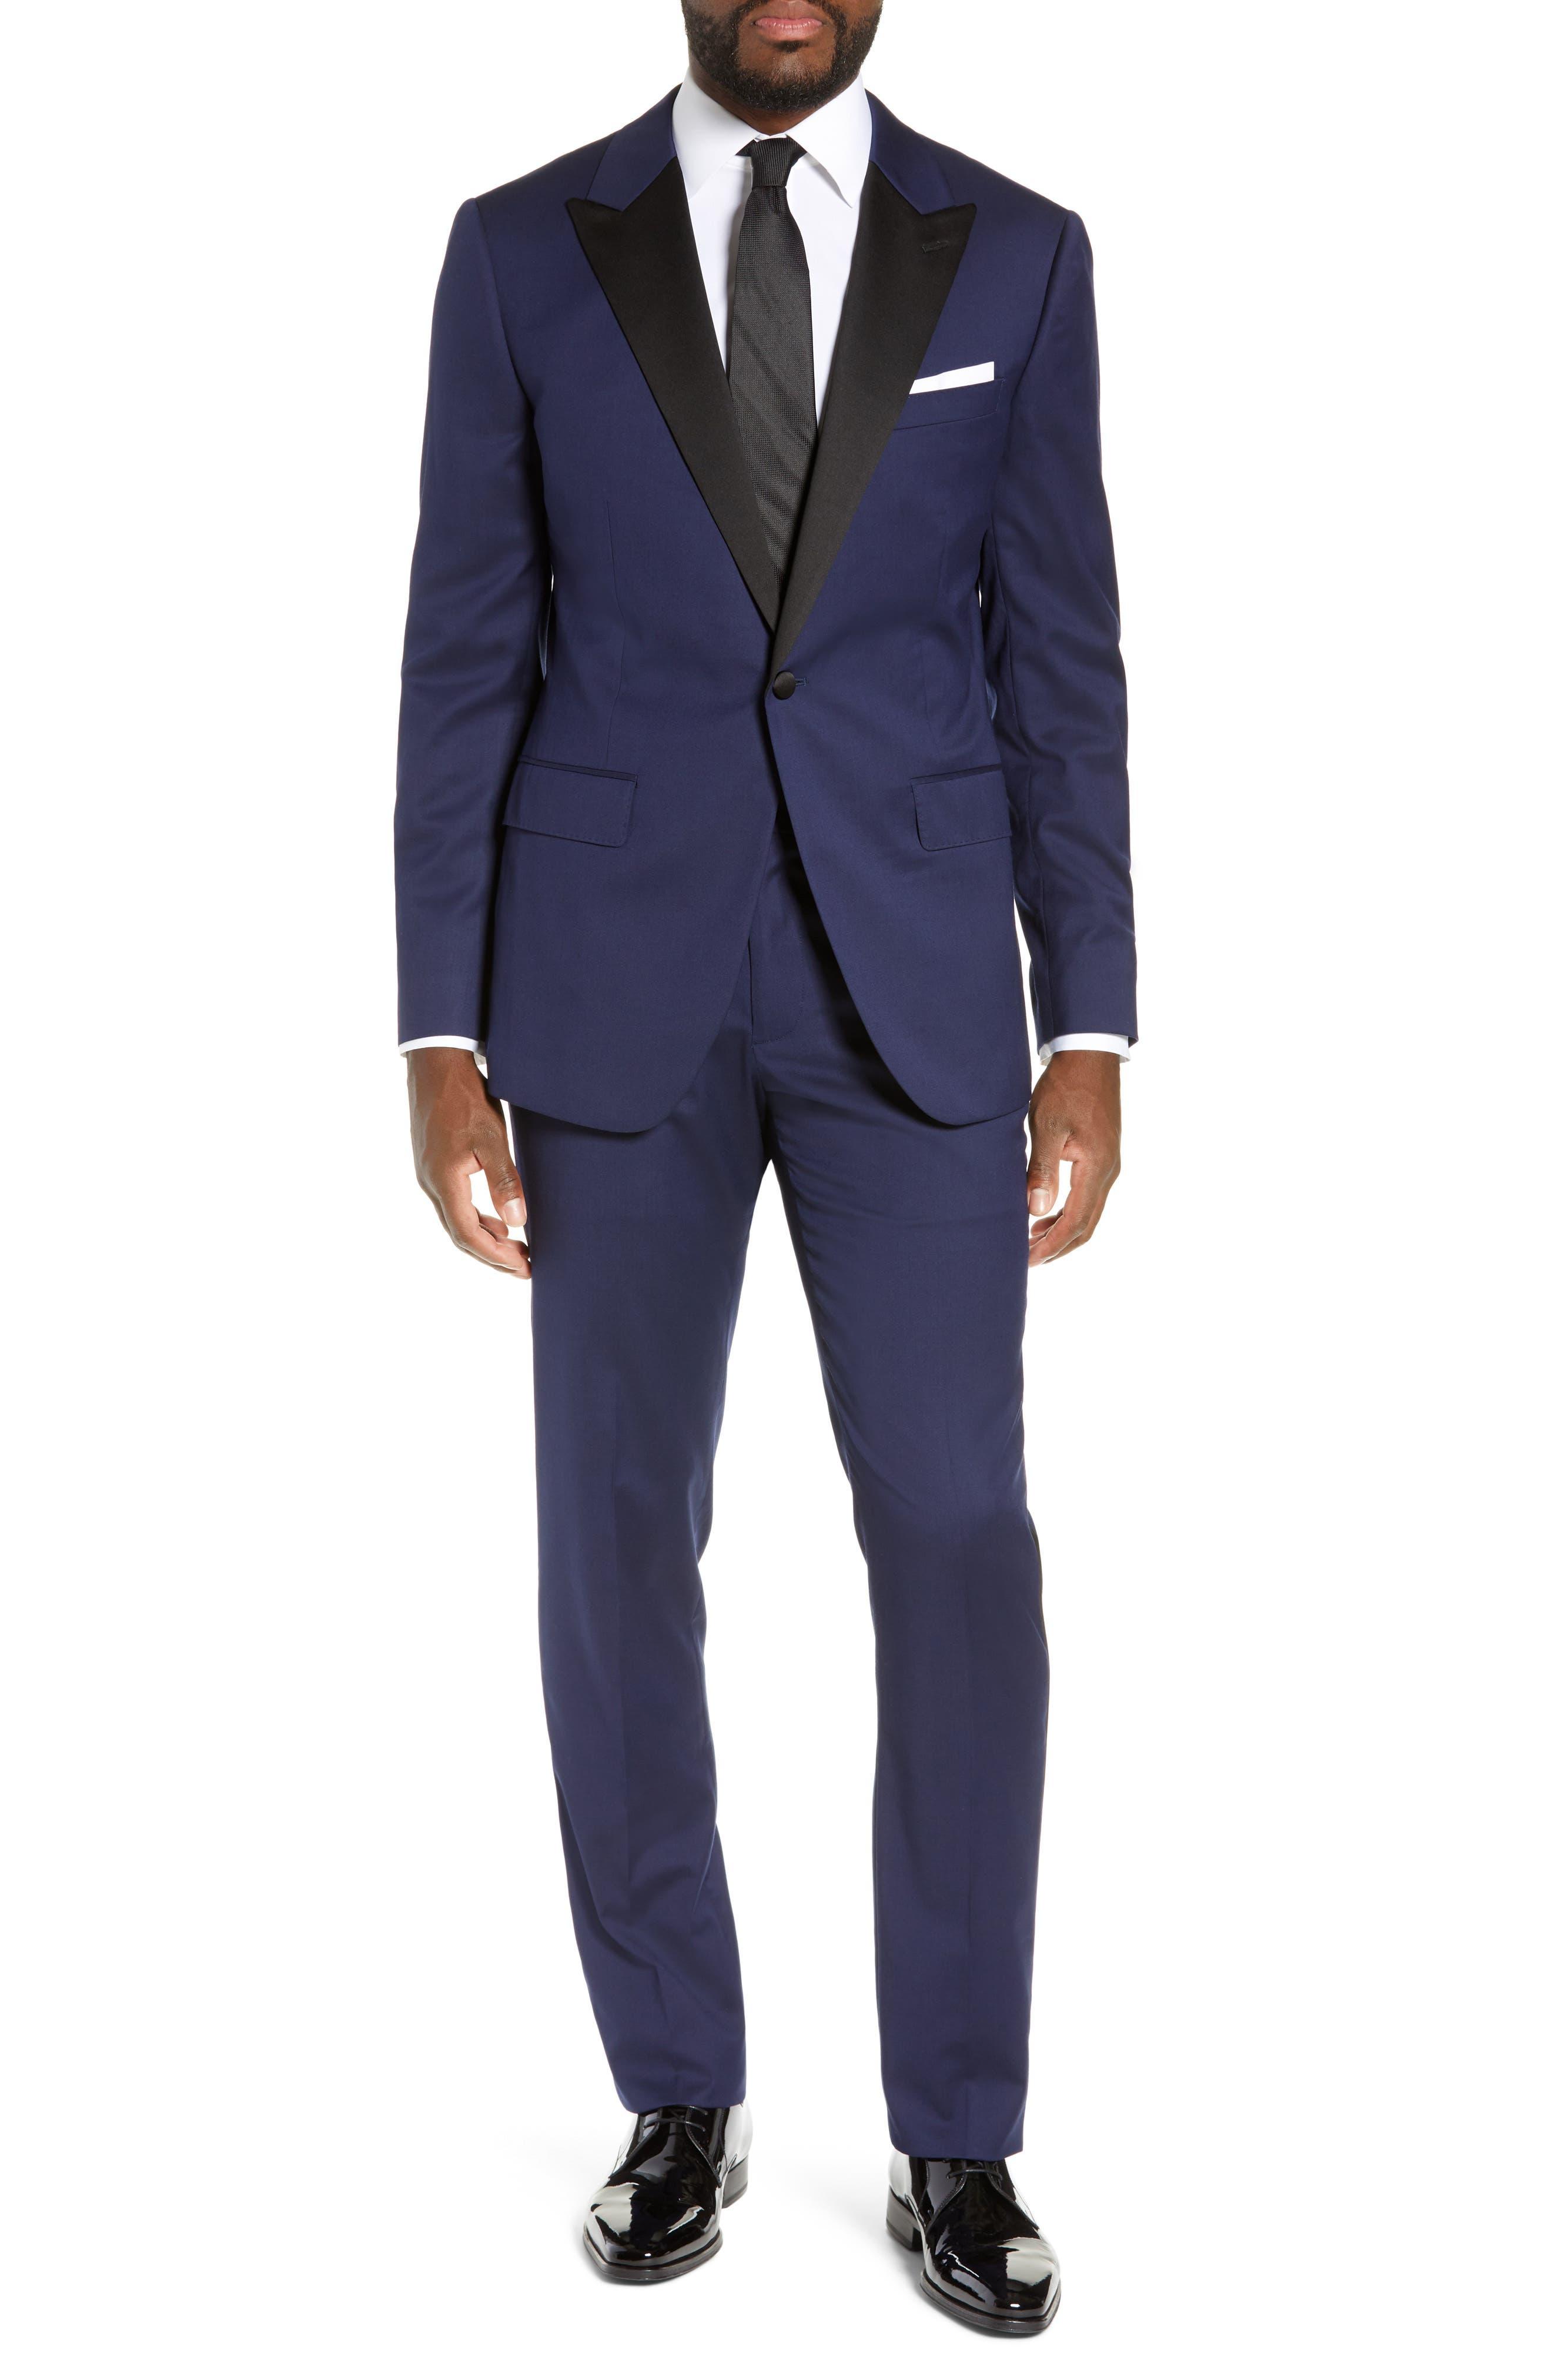 Capstone Slim Fit Tuxedo Trousers,                             Alternate thumbnail 7, color,                             NAVY